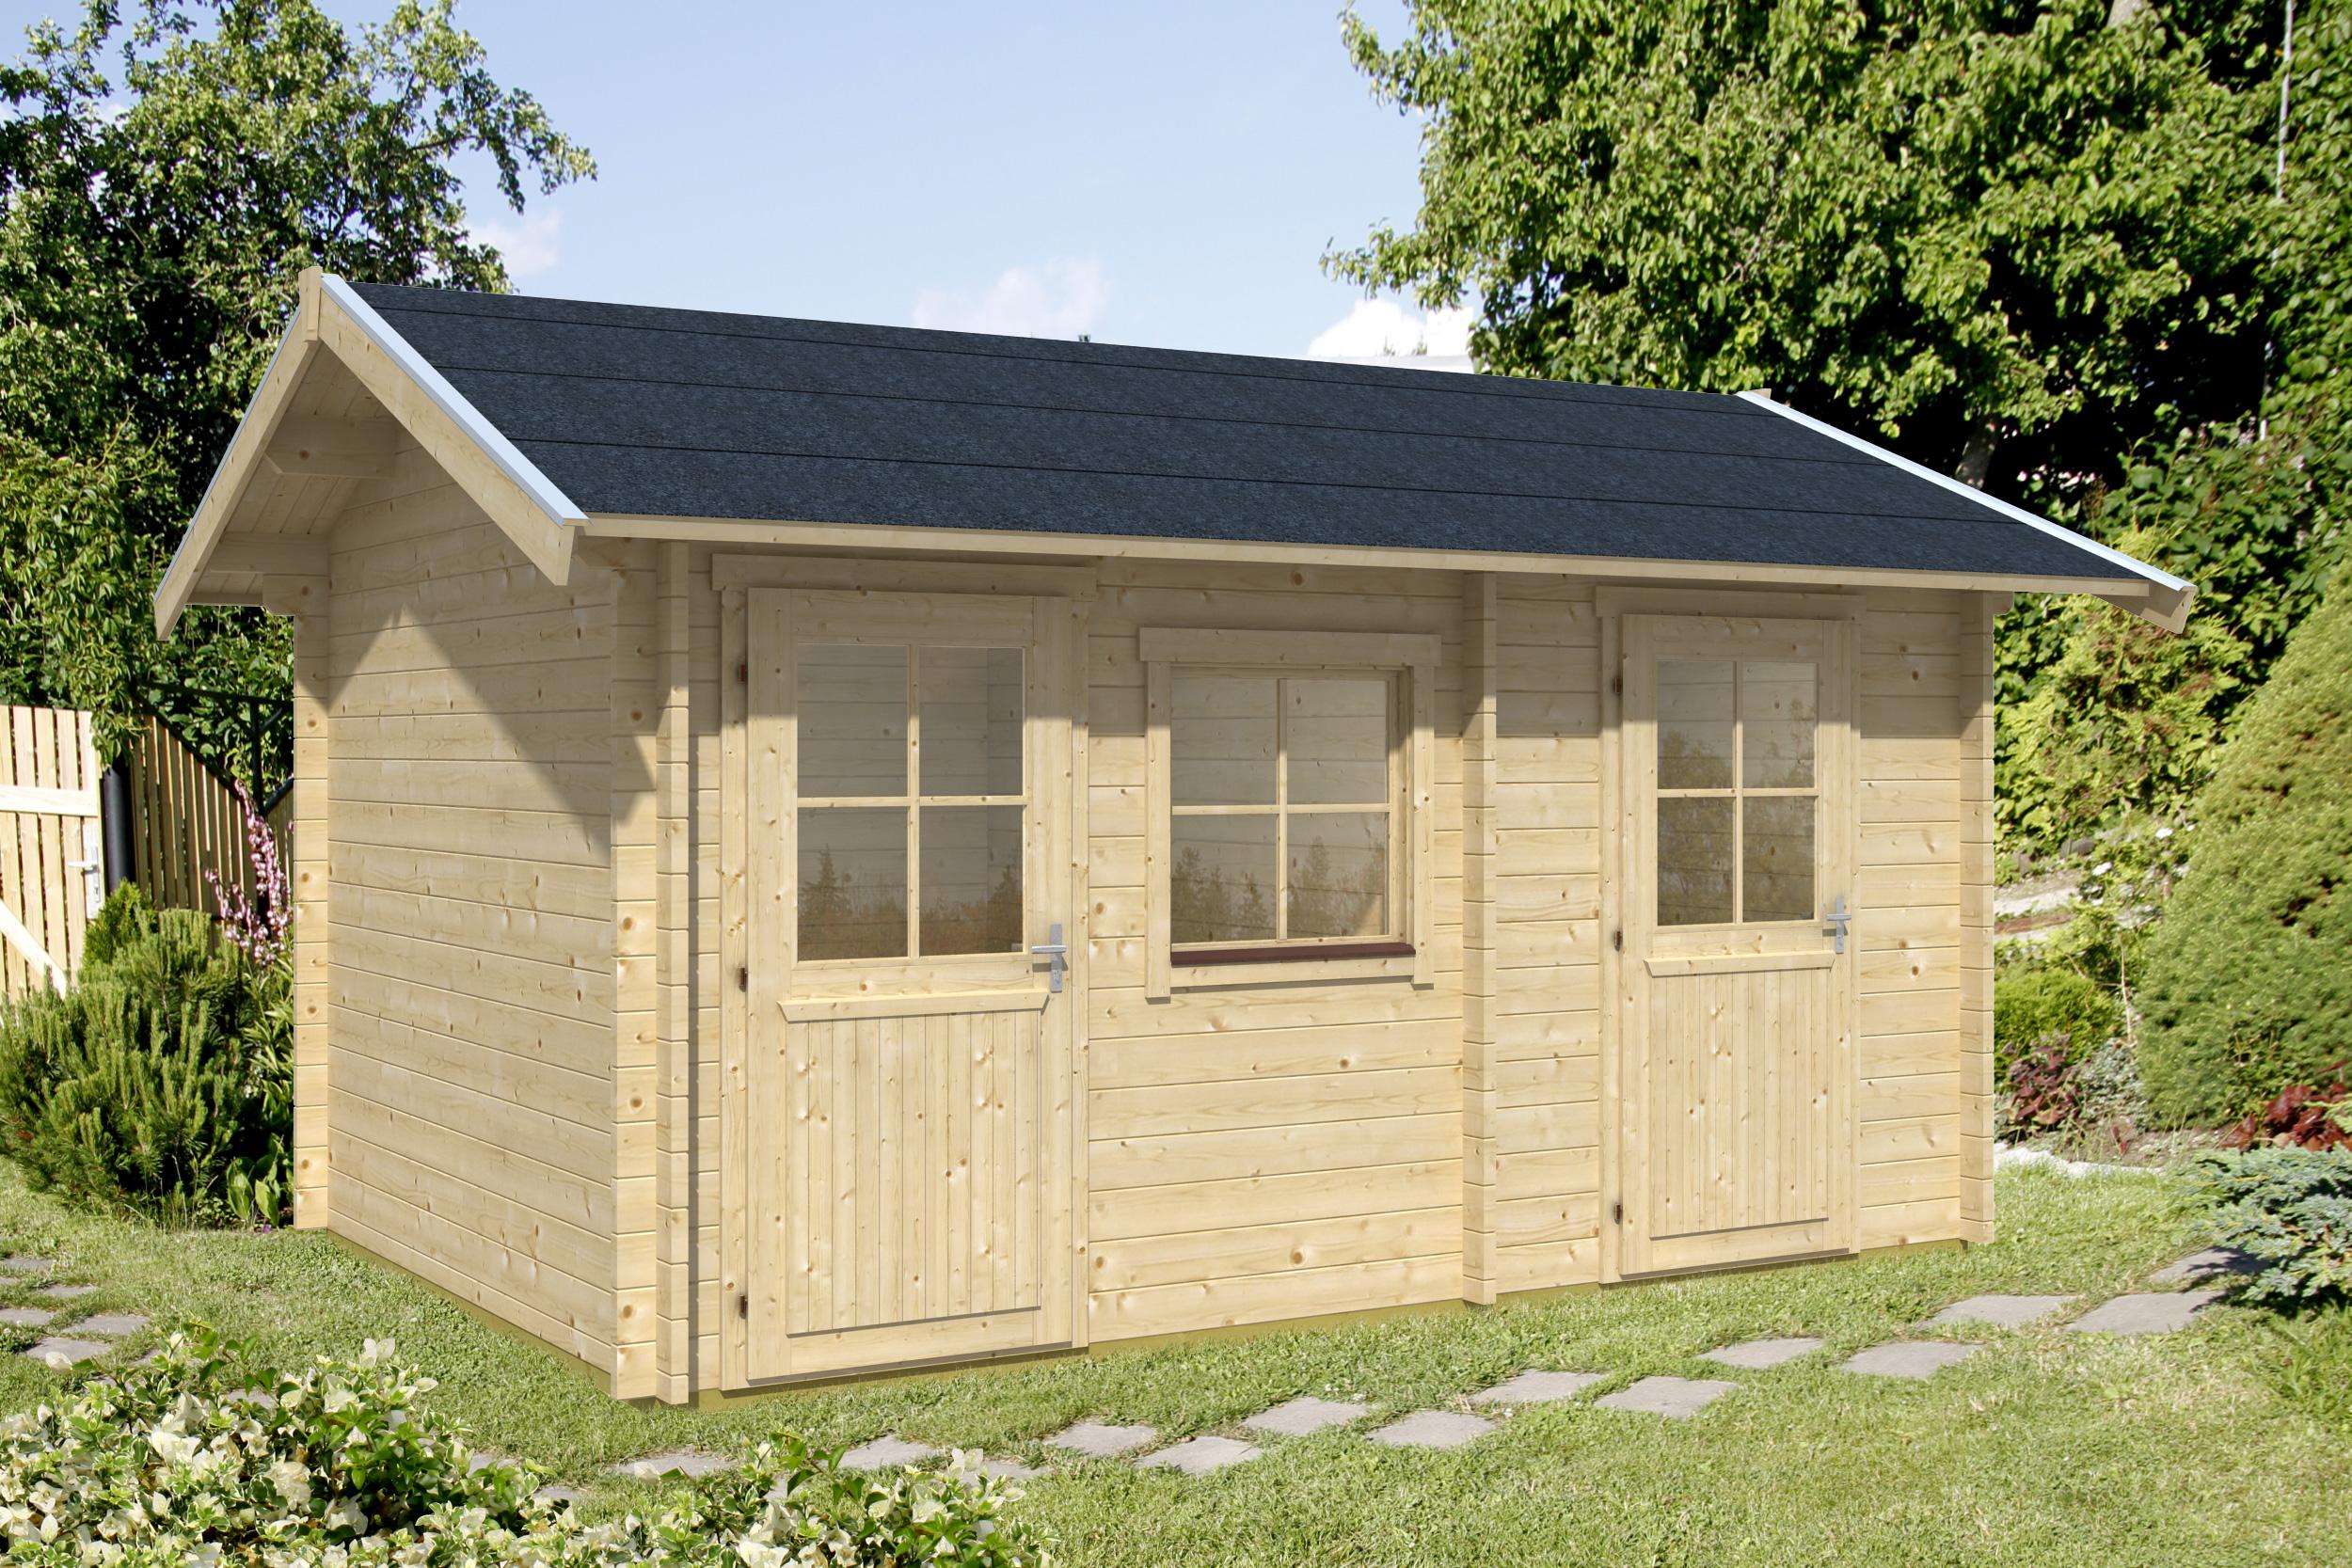 gartenhaus lausanne 45 mm ca 430x280 cm holzwurm obersayn. Black Bedroom Furniture Sets. Home Design Ideas